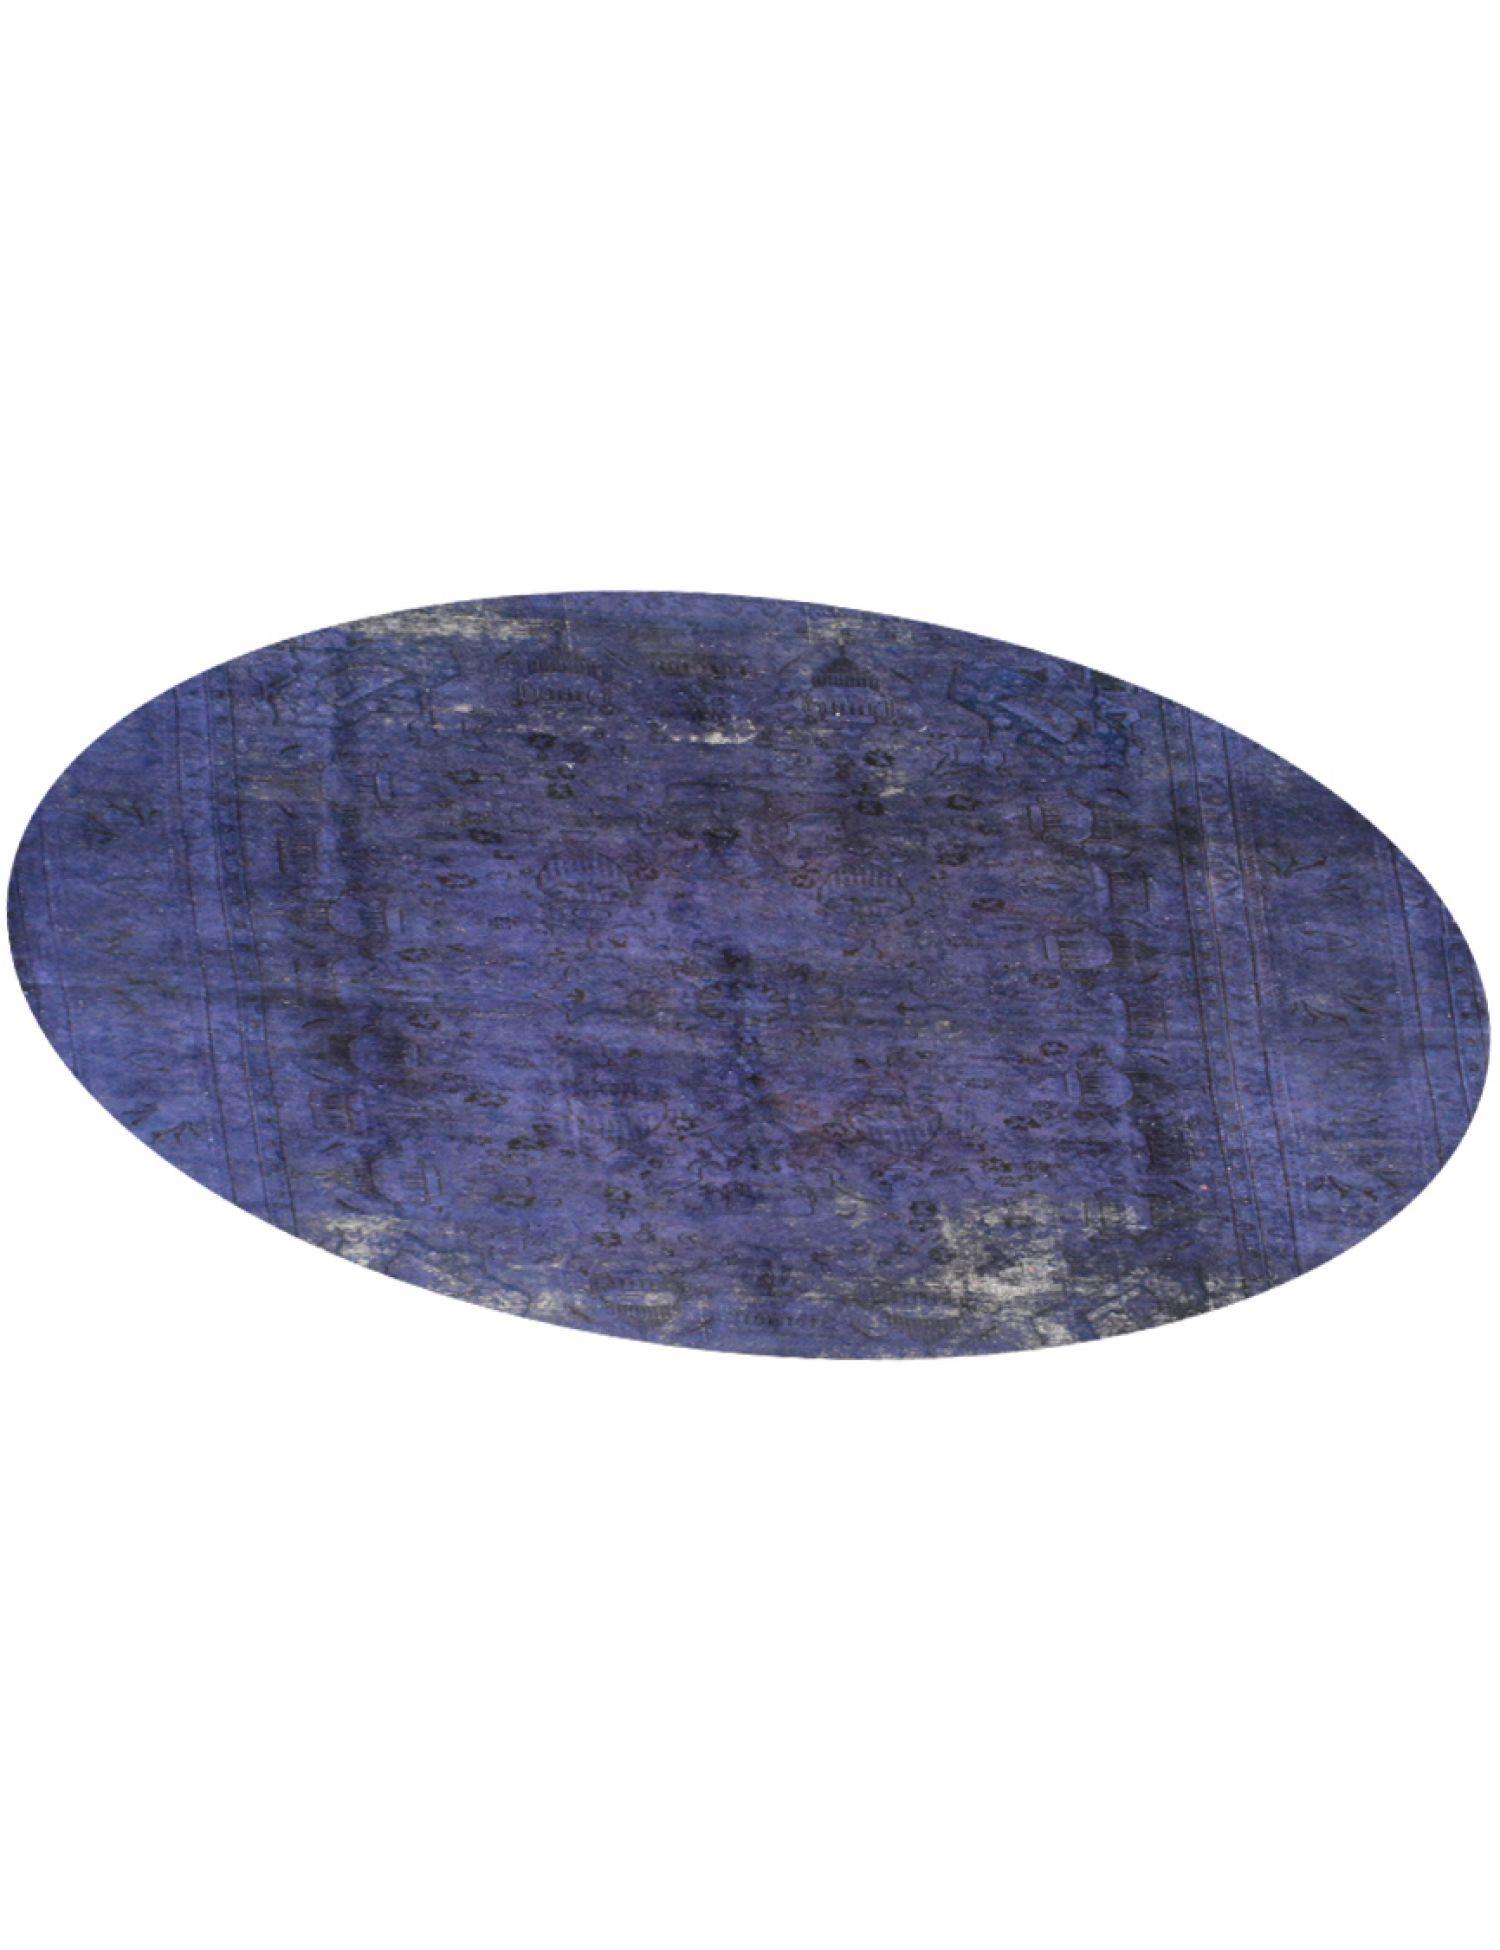 Tappeto Vintage  blu <br/>280 x 280 cm